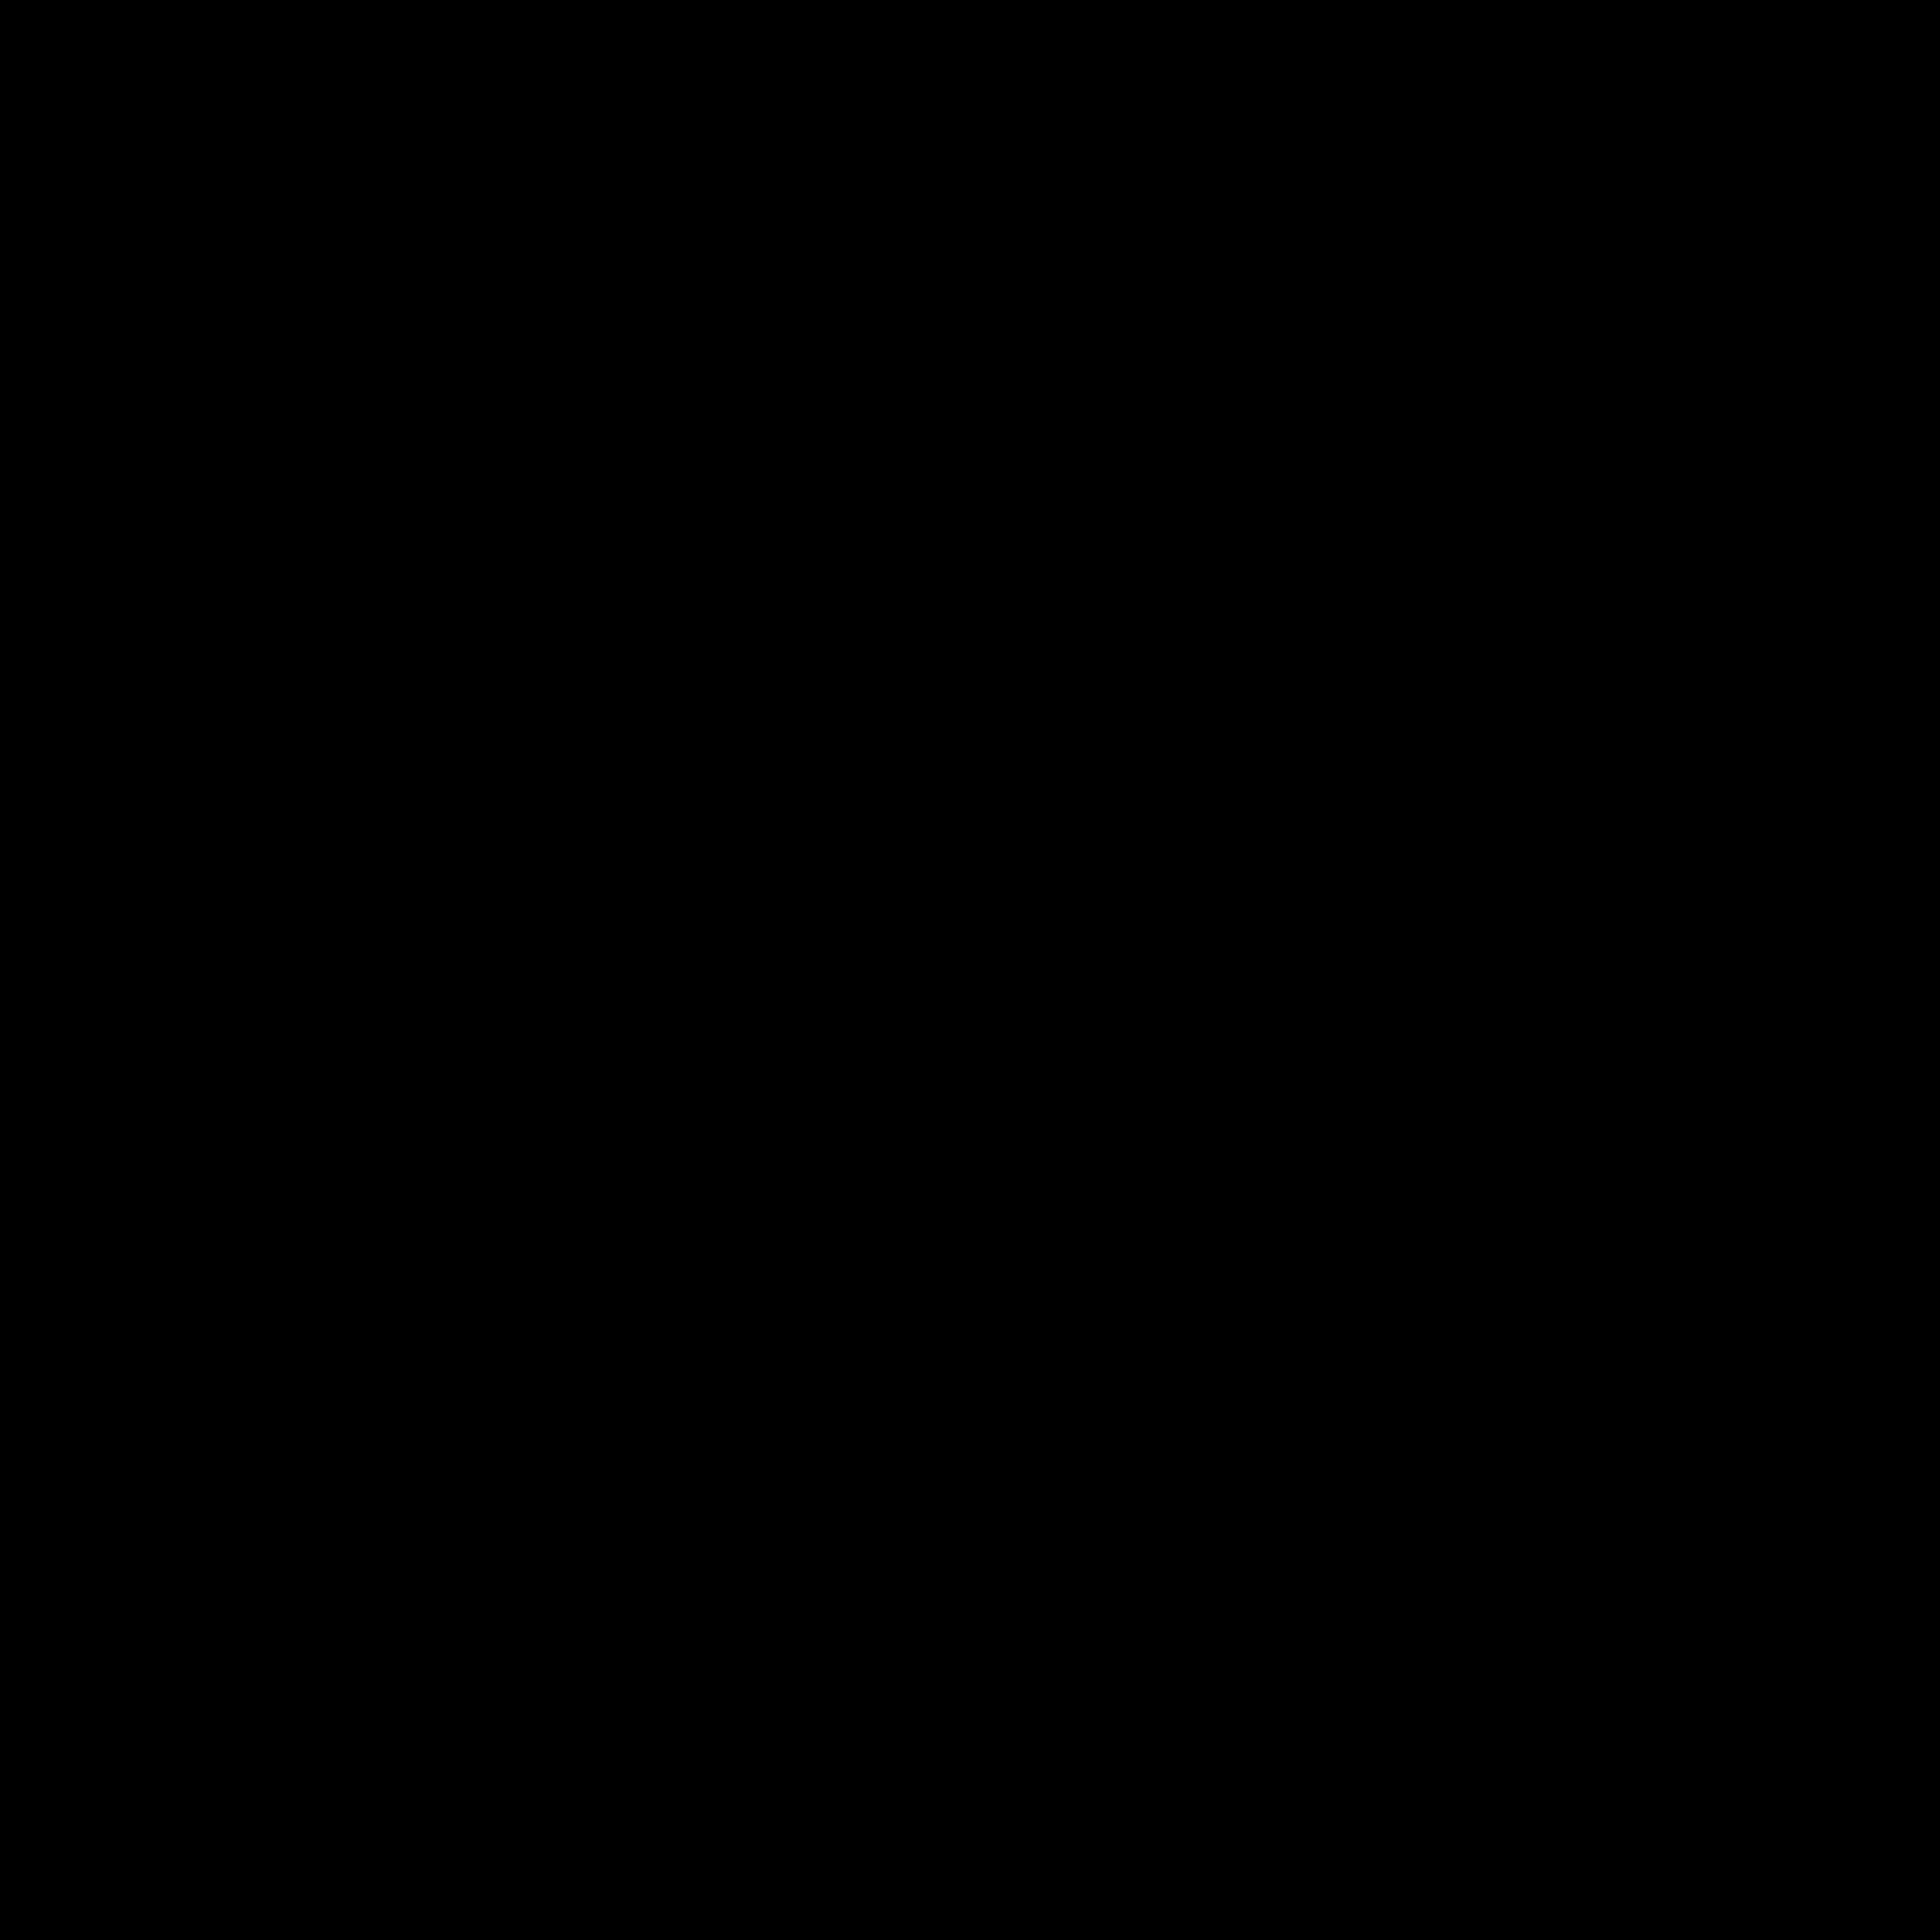 macintosh logo png transparent amp svg vector freebie supply